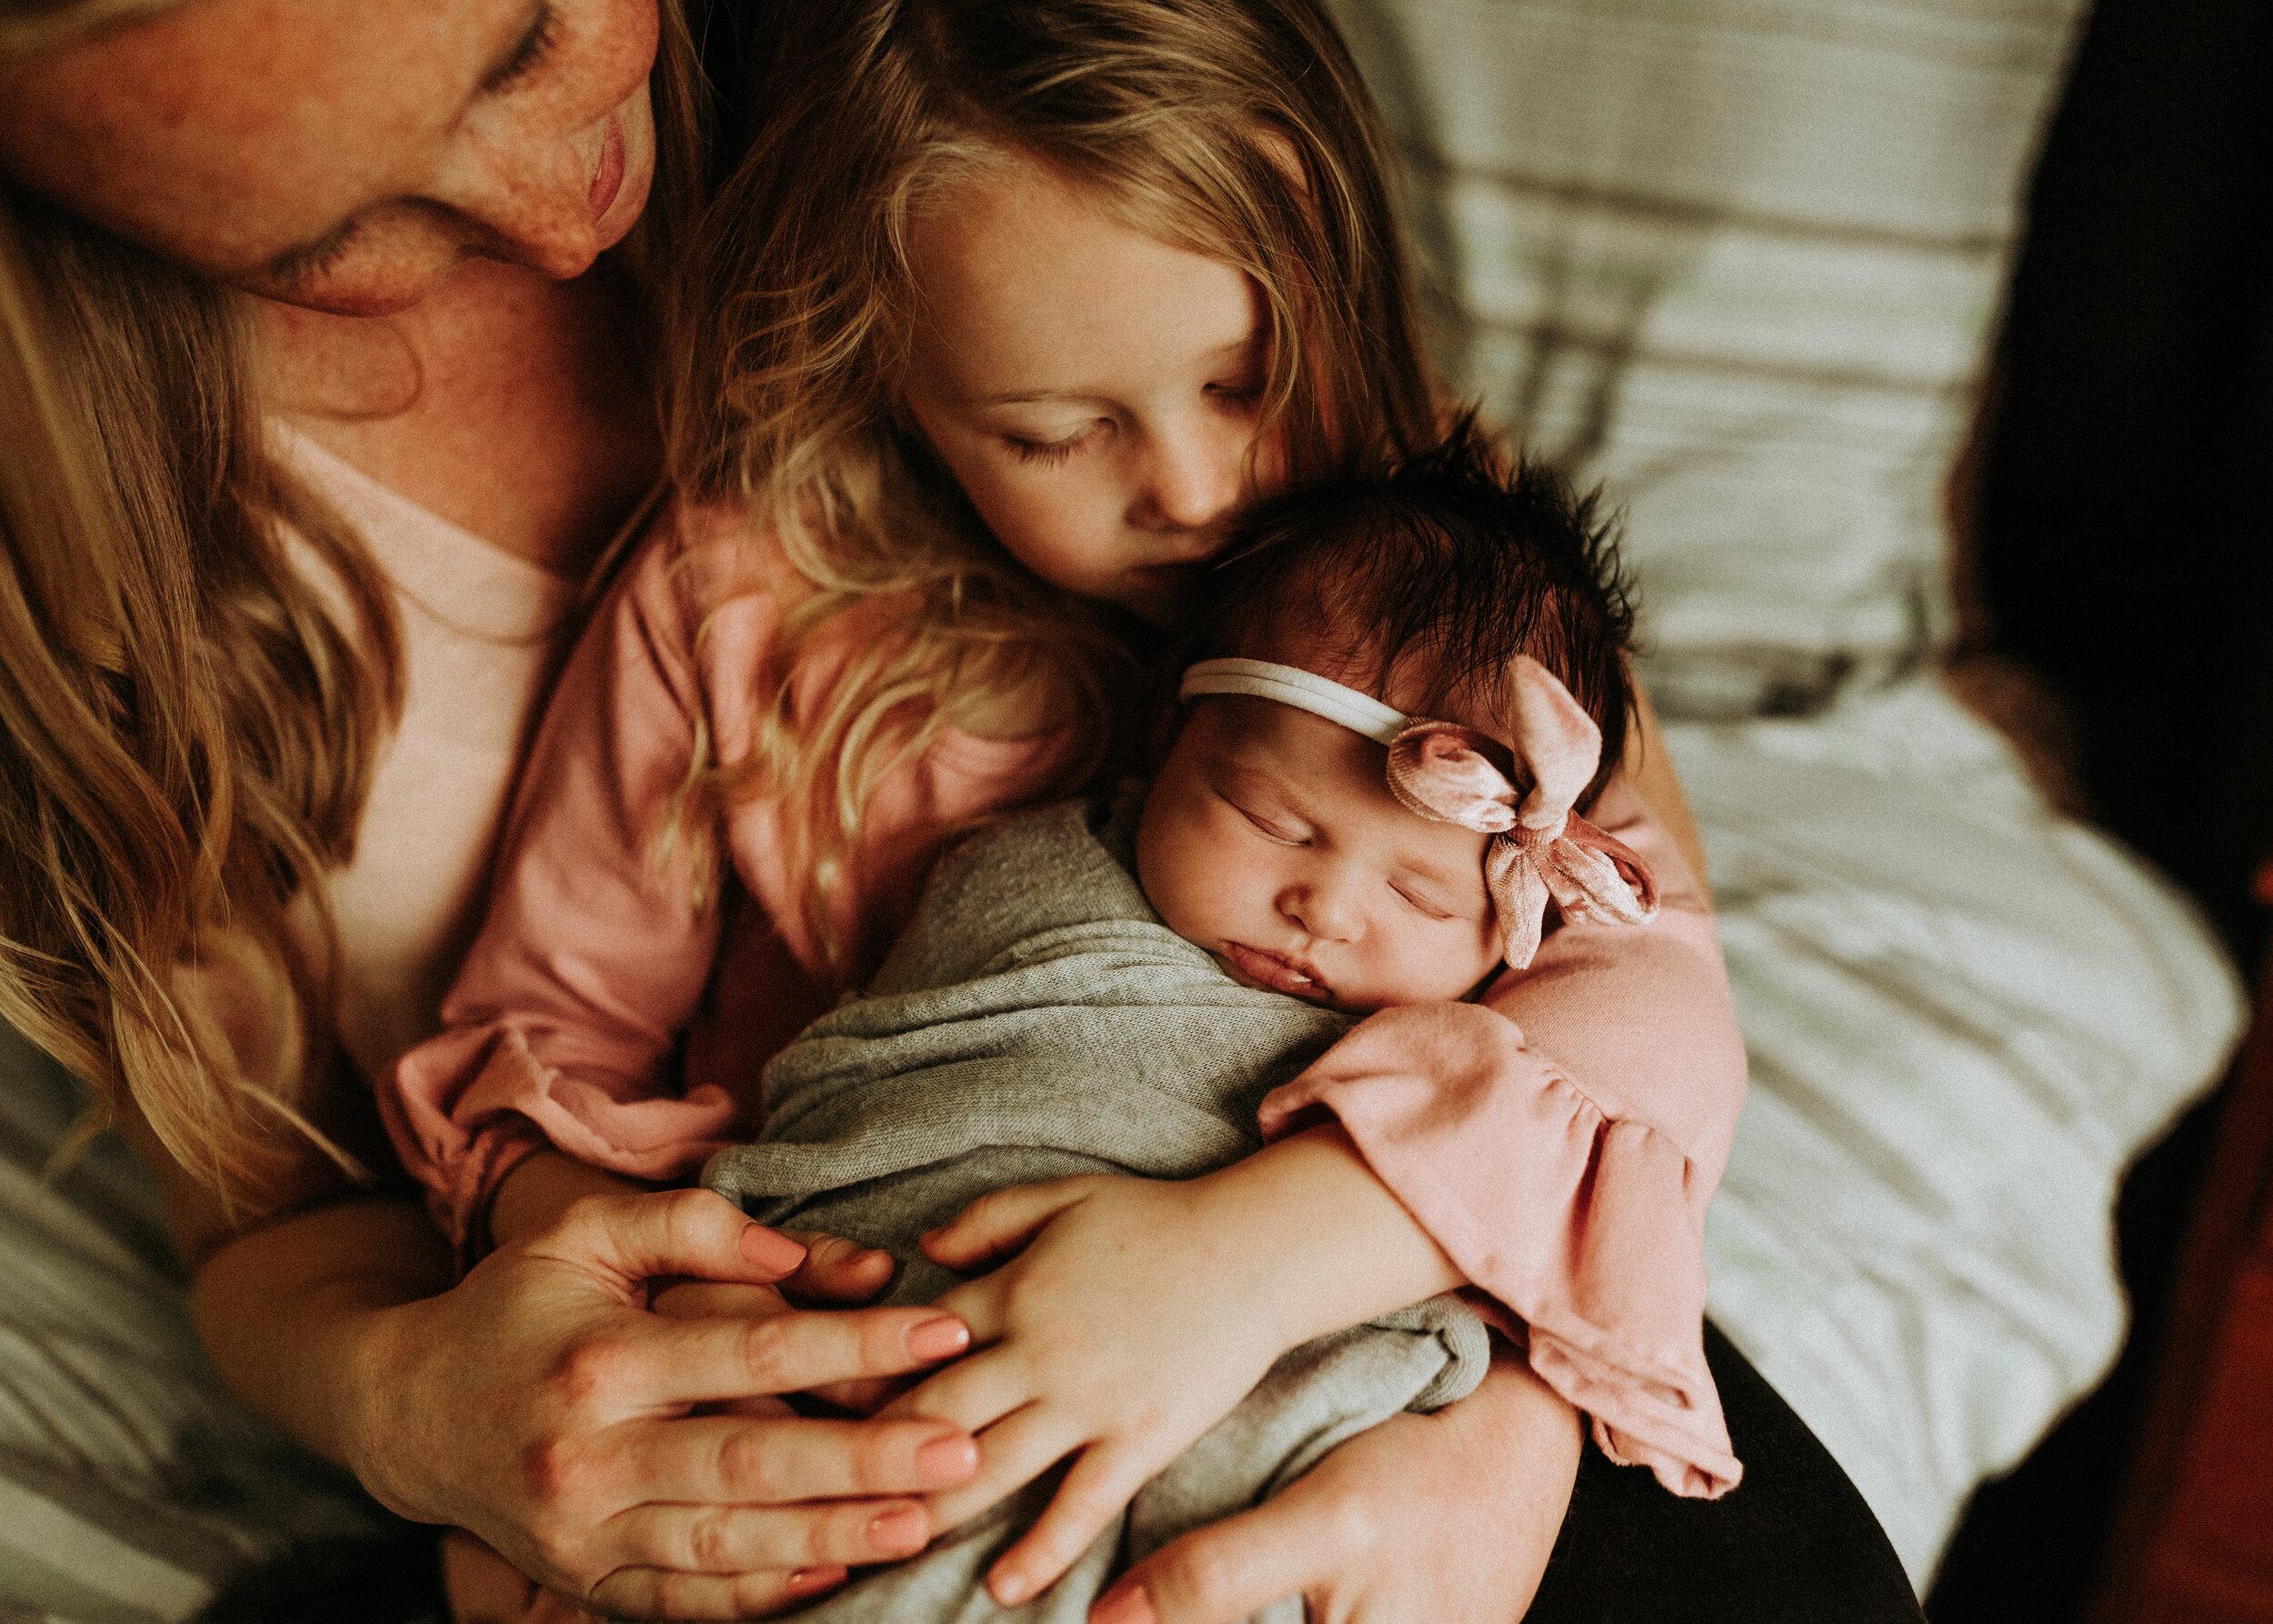 Newborn-Photographer-Bellingham-Wa-Brianne-Bell-Photography-(Dottie)-58.jpg